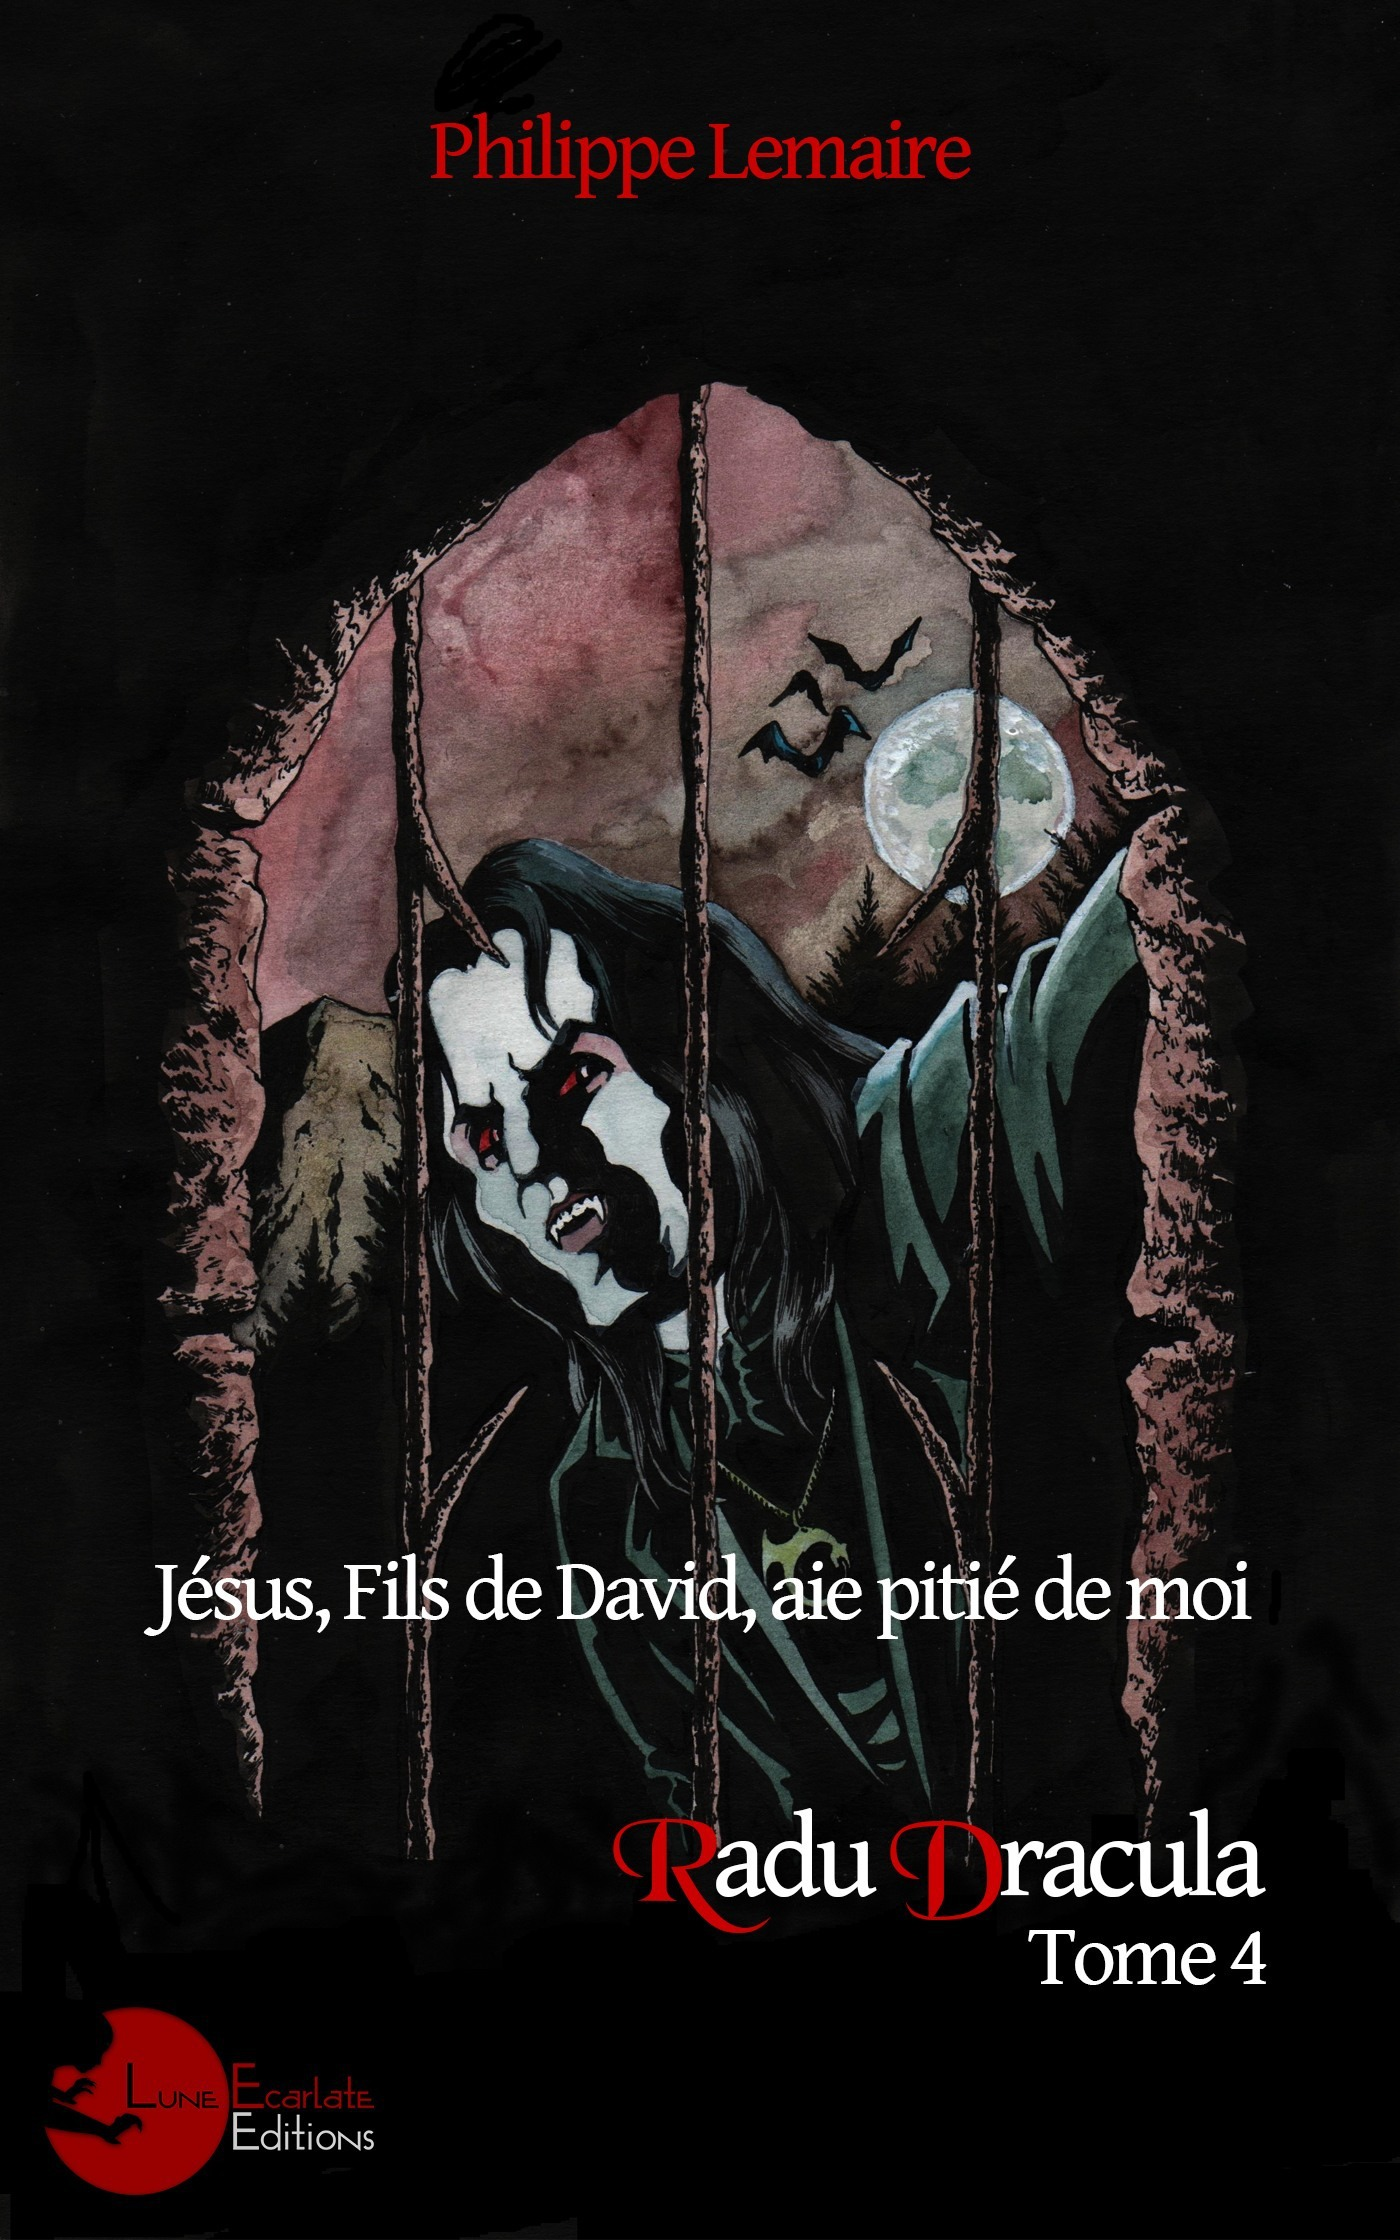 Jésus, fils de David, aie pitié de moi - Radu Basarab Dracula - 4